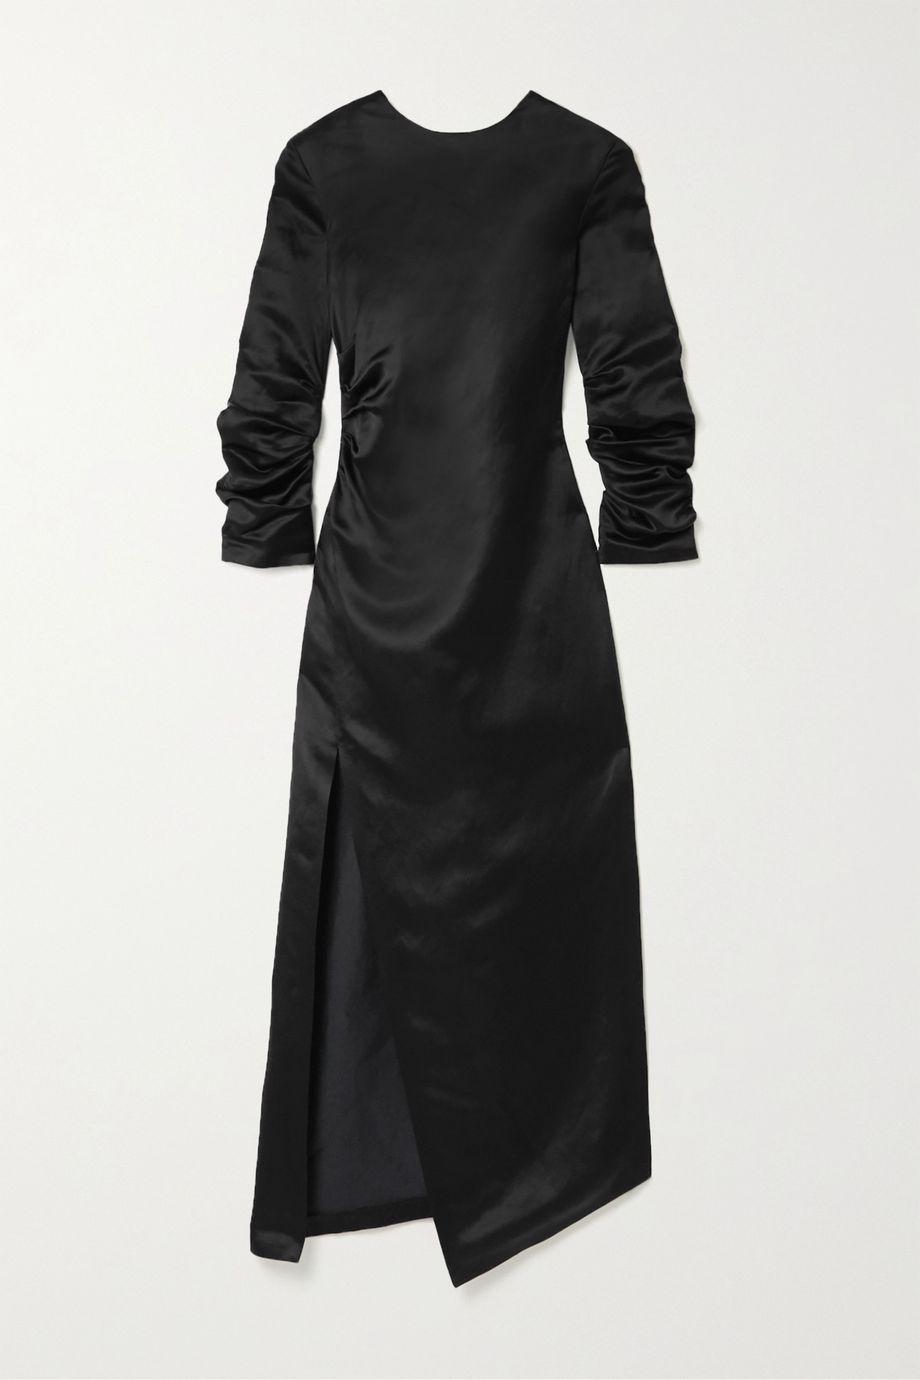 A.W.A.K.E. MODE Gathered cupro and linen-blend satin midi dress